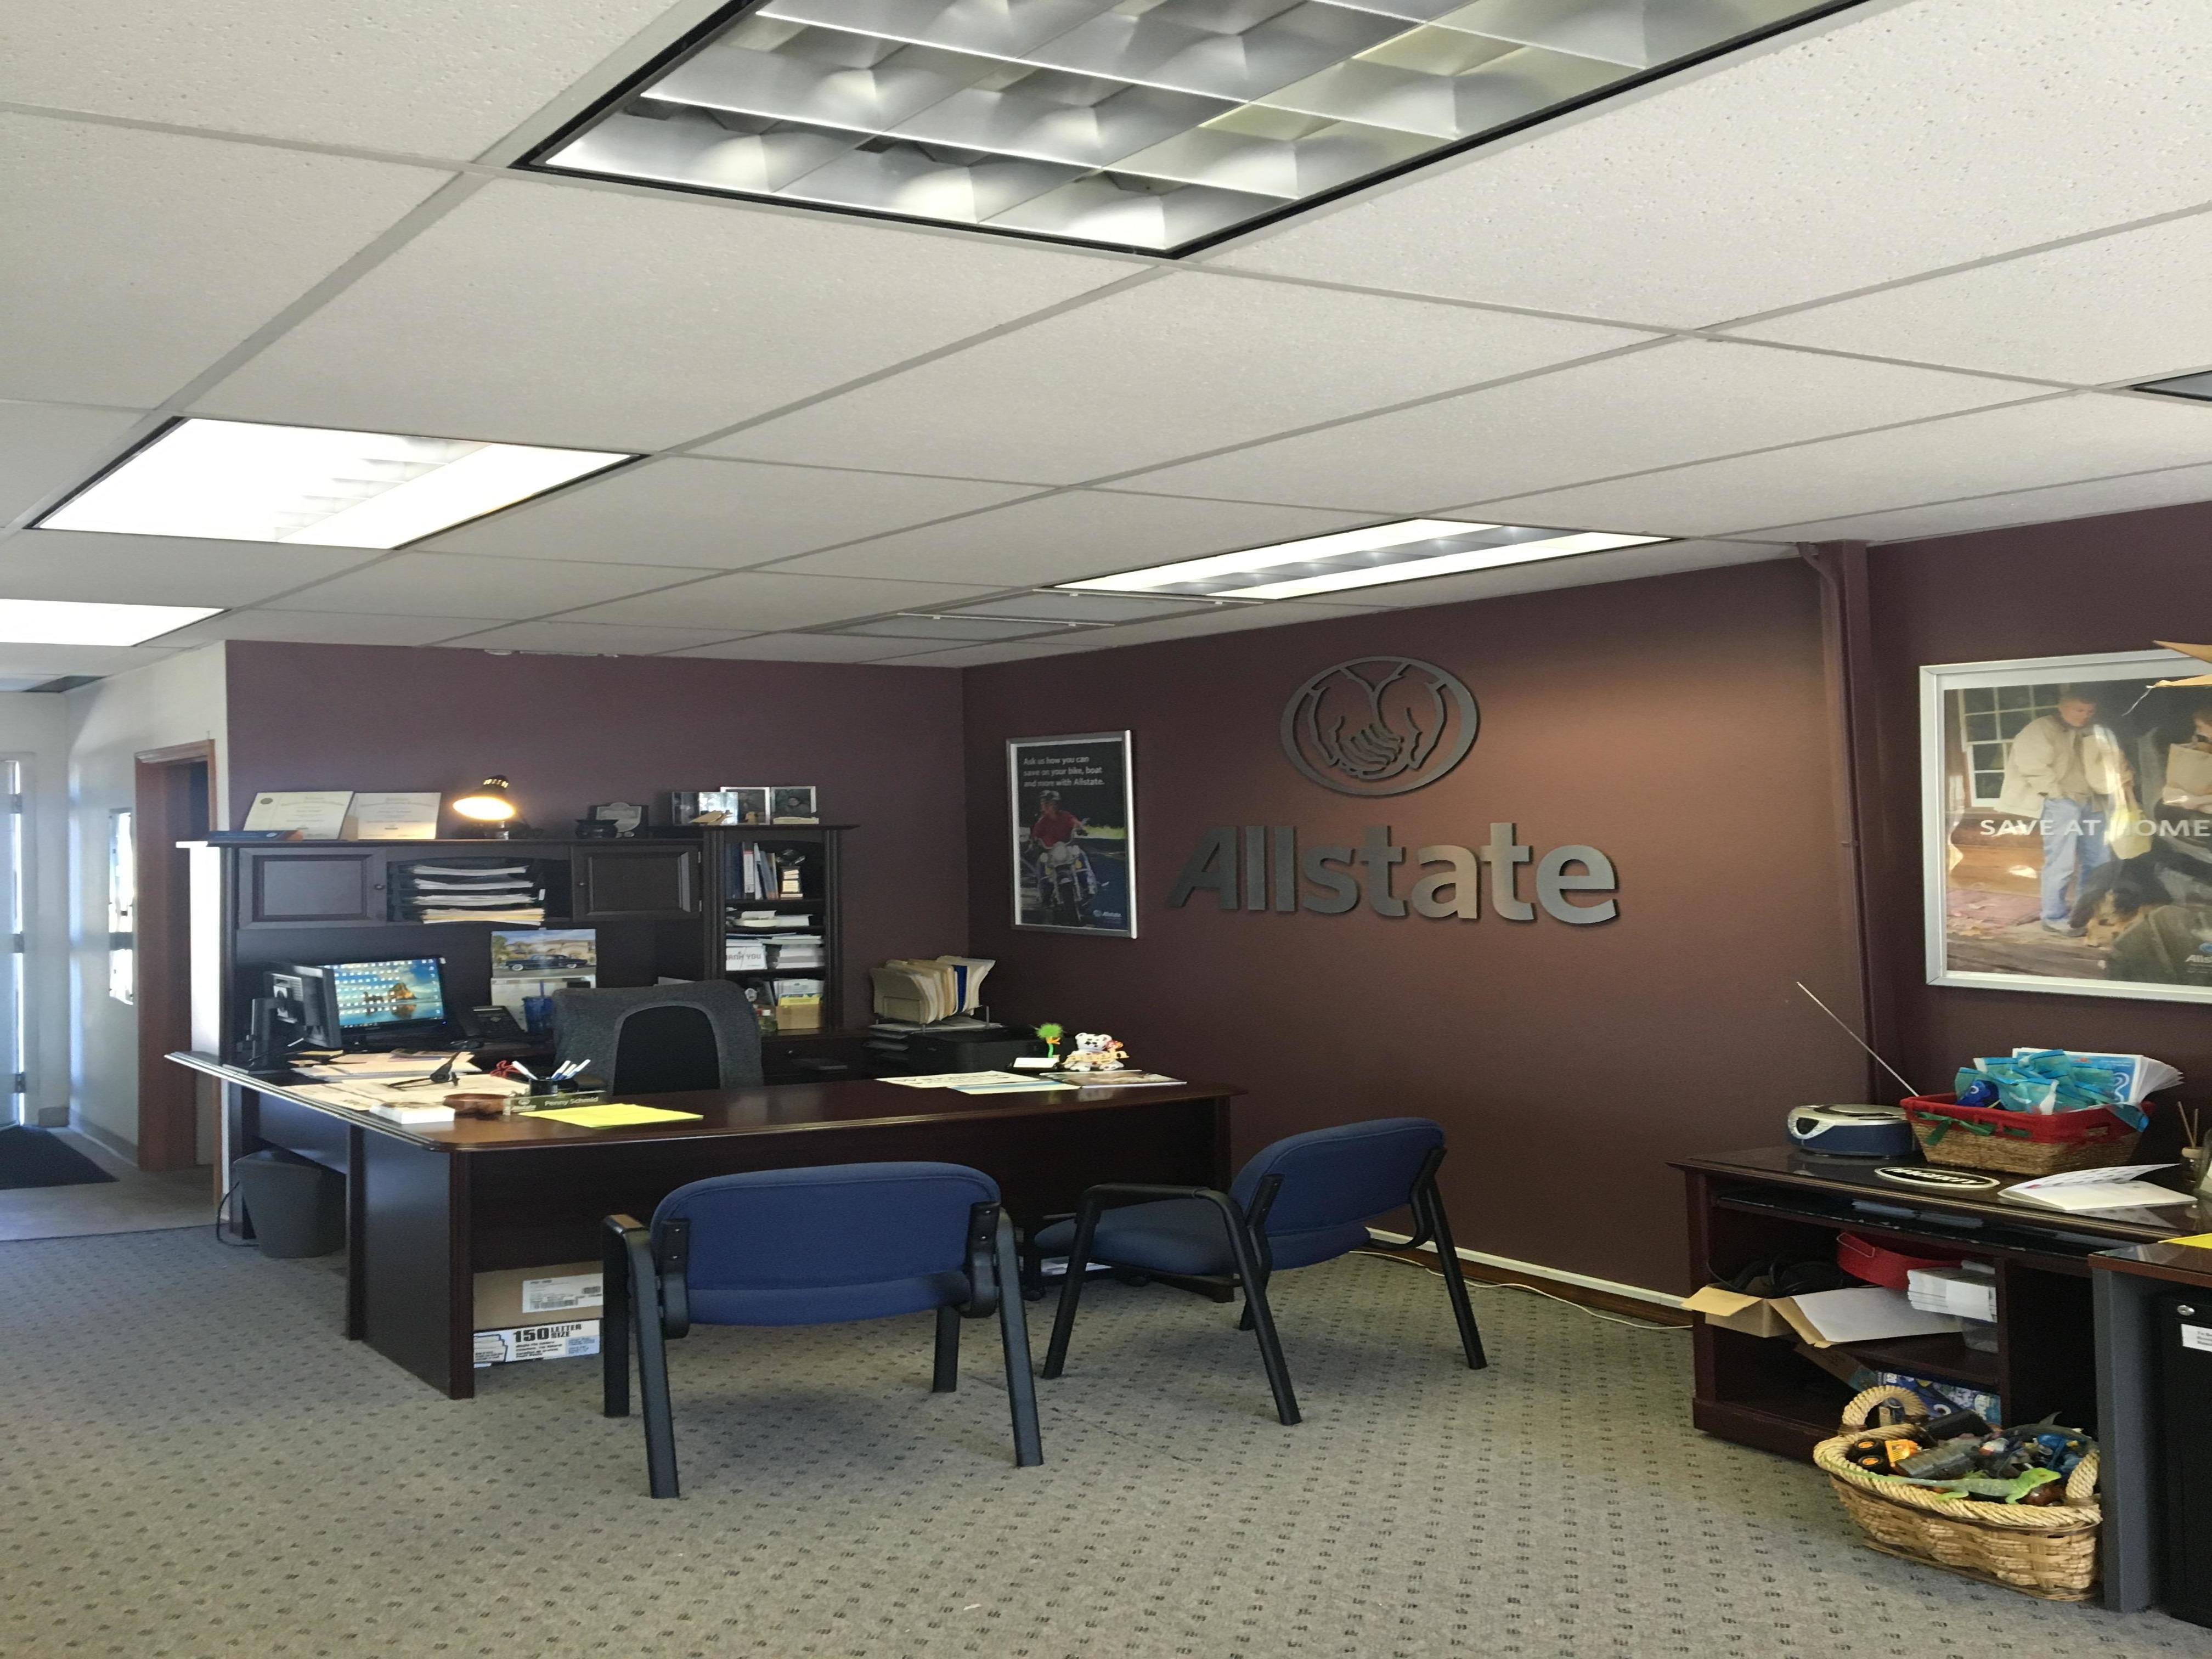 Kevin Saddler: Allstate Insurance image 4